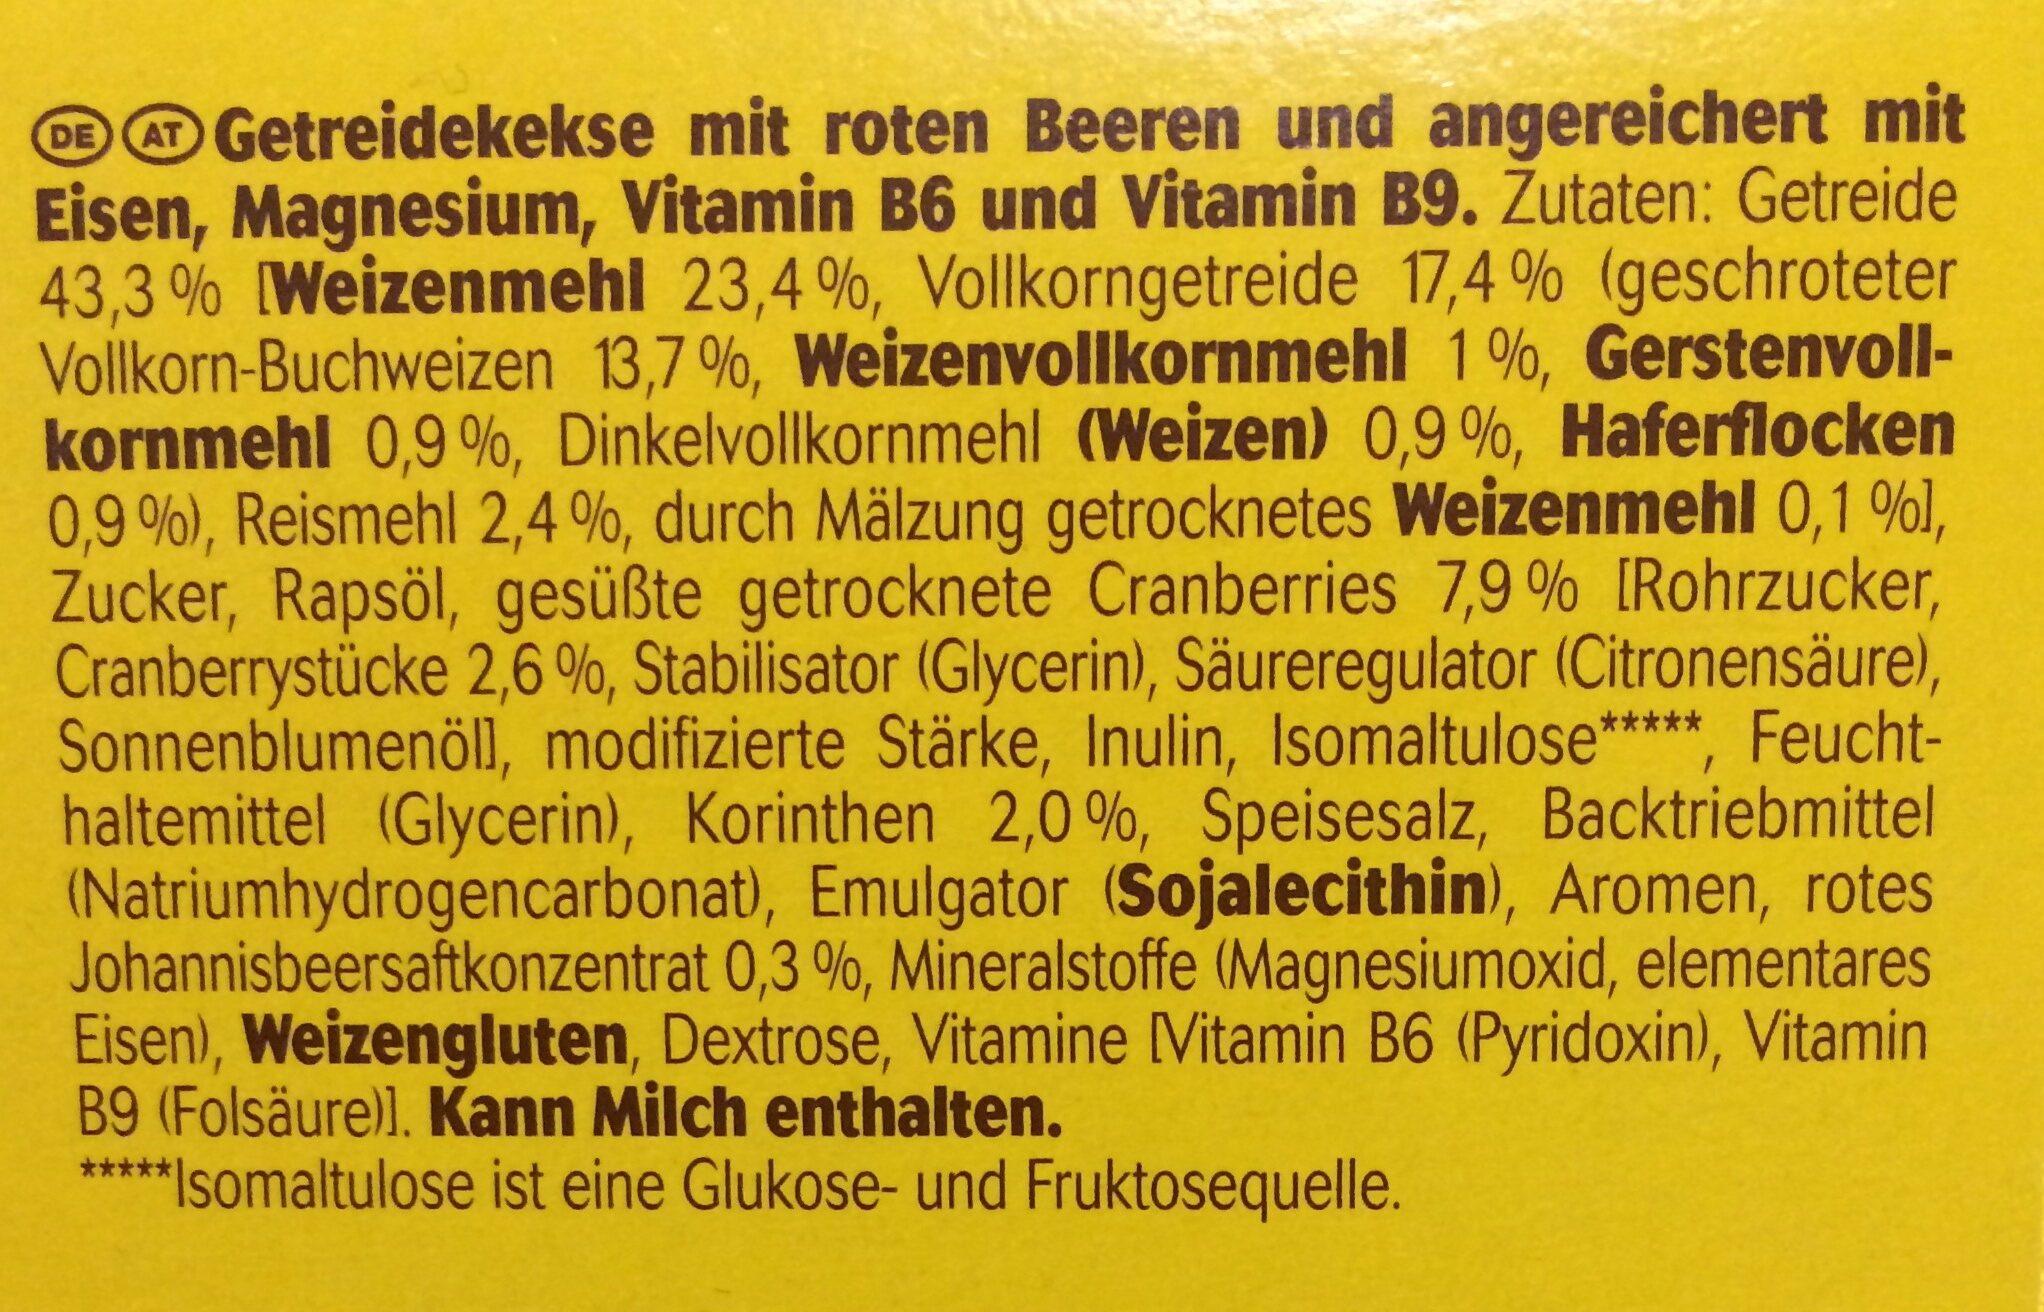 Belvita Soft Rote Beeren - Inhaltsstoffe